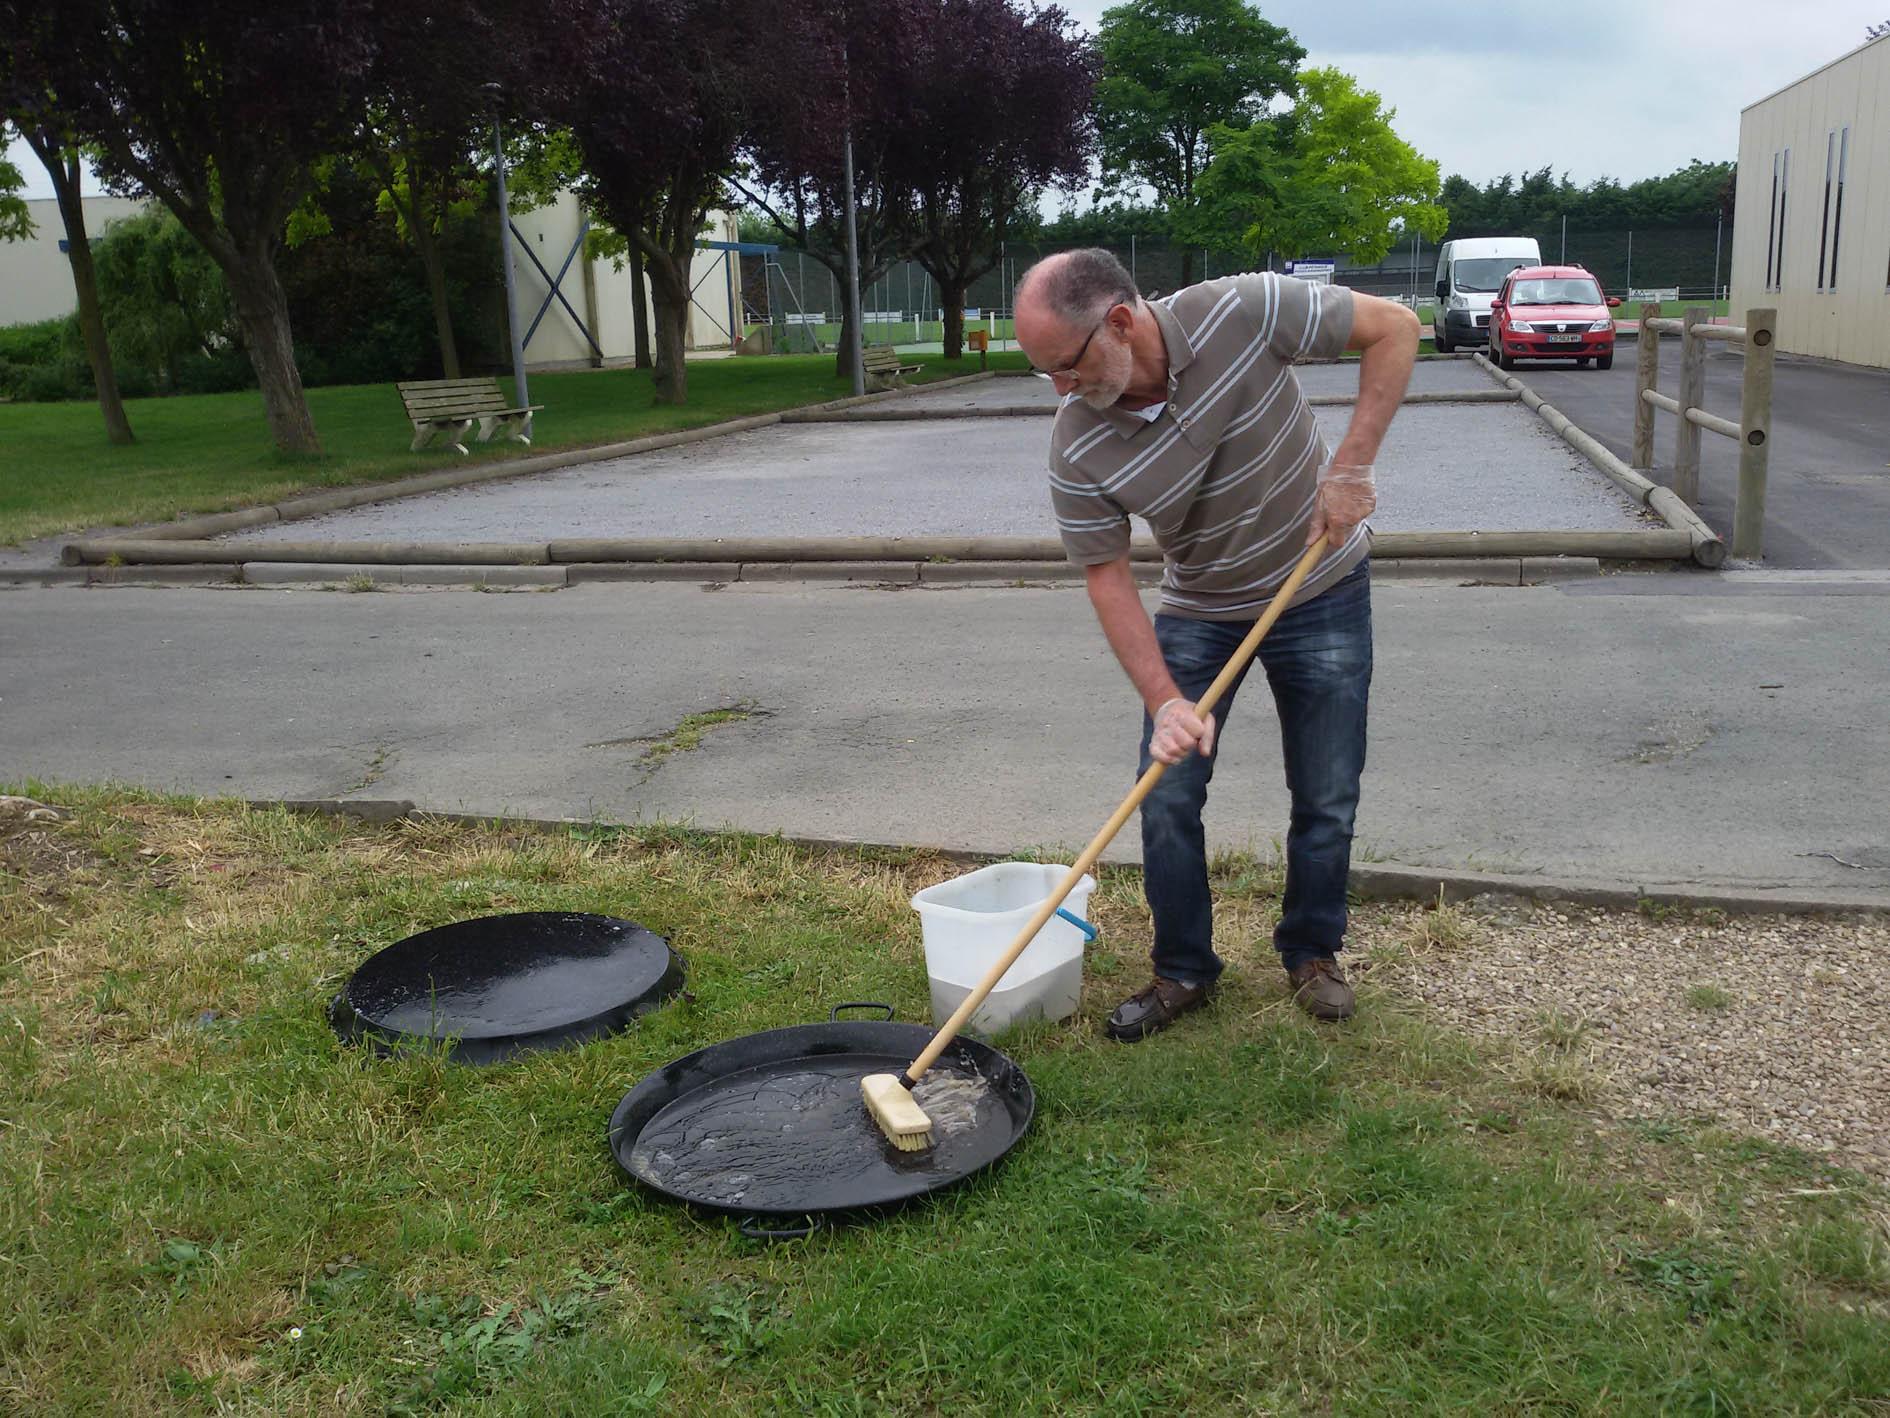 et du nettoyage de grosse casserole !